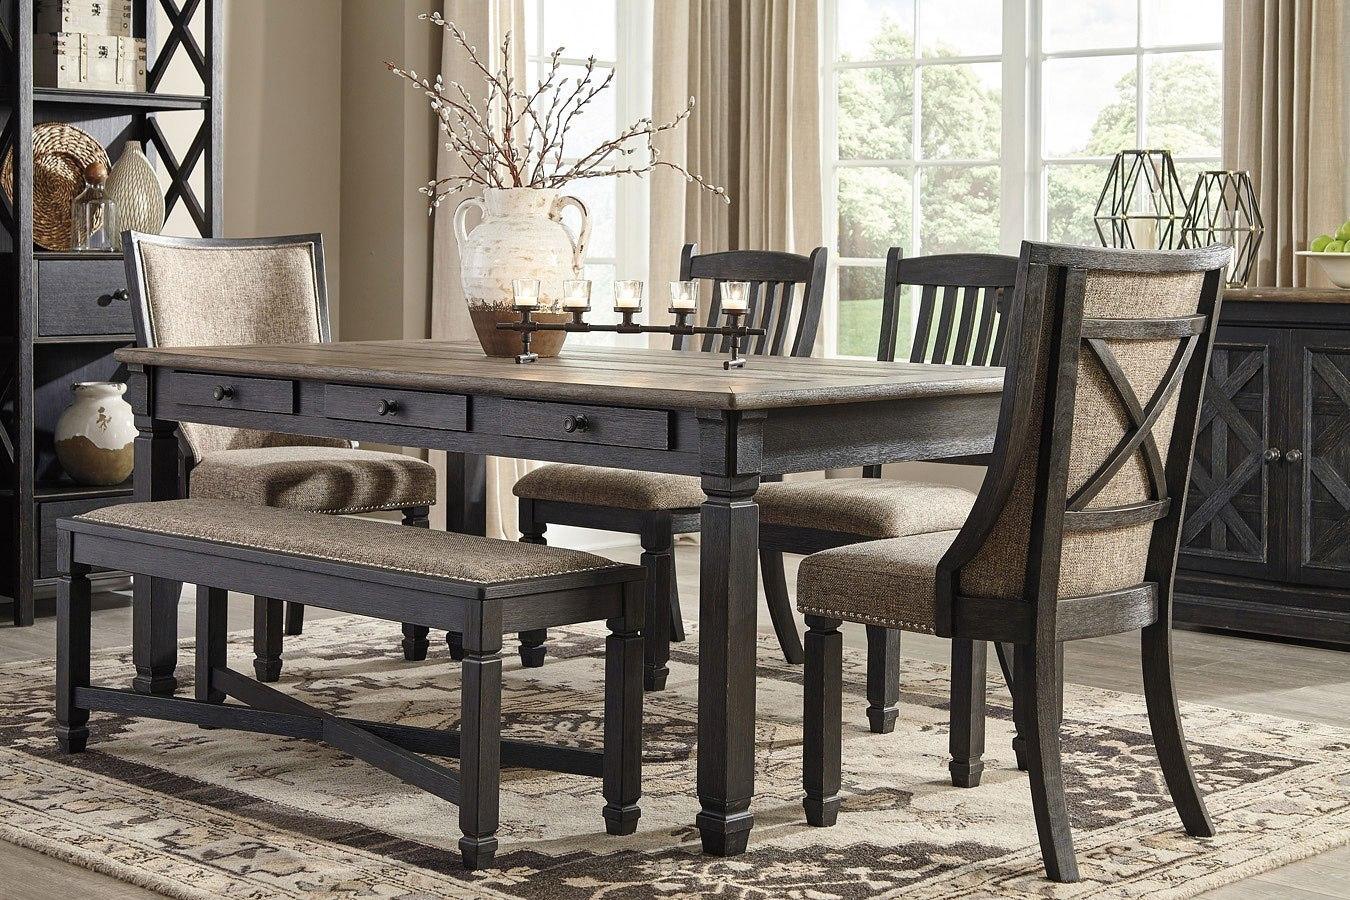 Tyler Creek Rectangular Dining Set W/ Upholstered Chairs ...